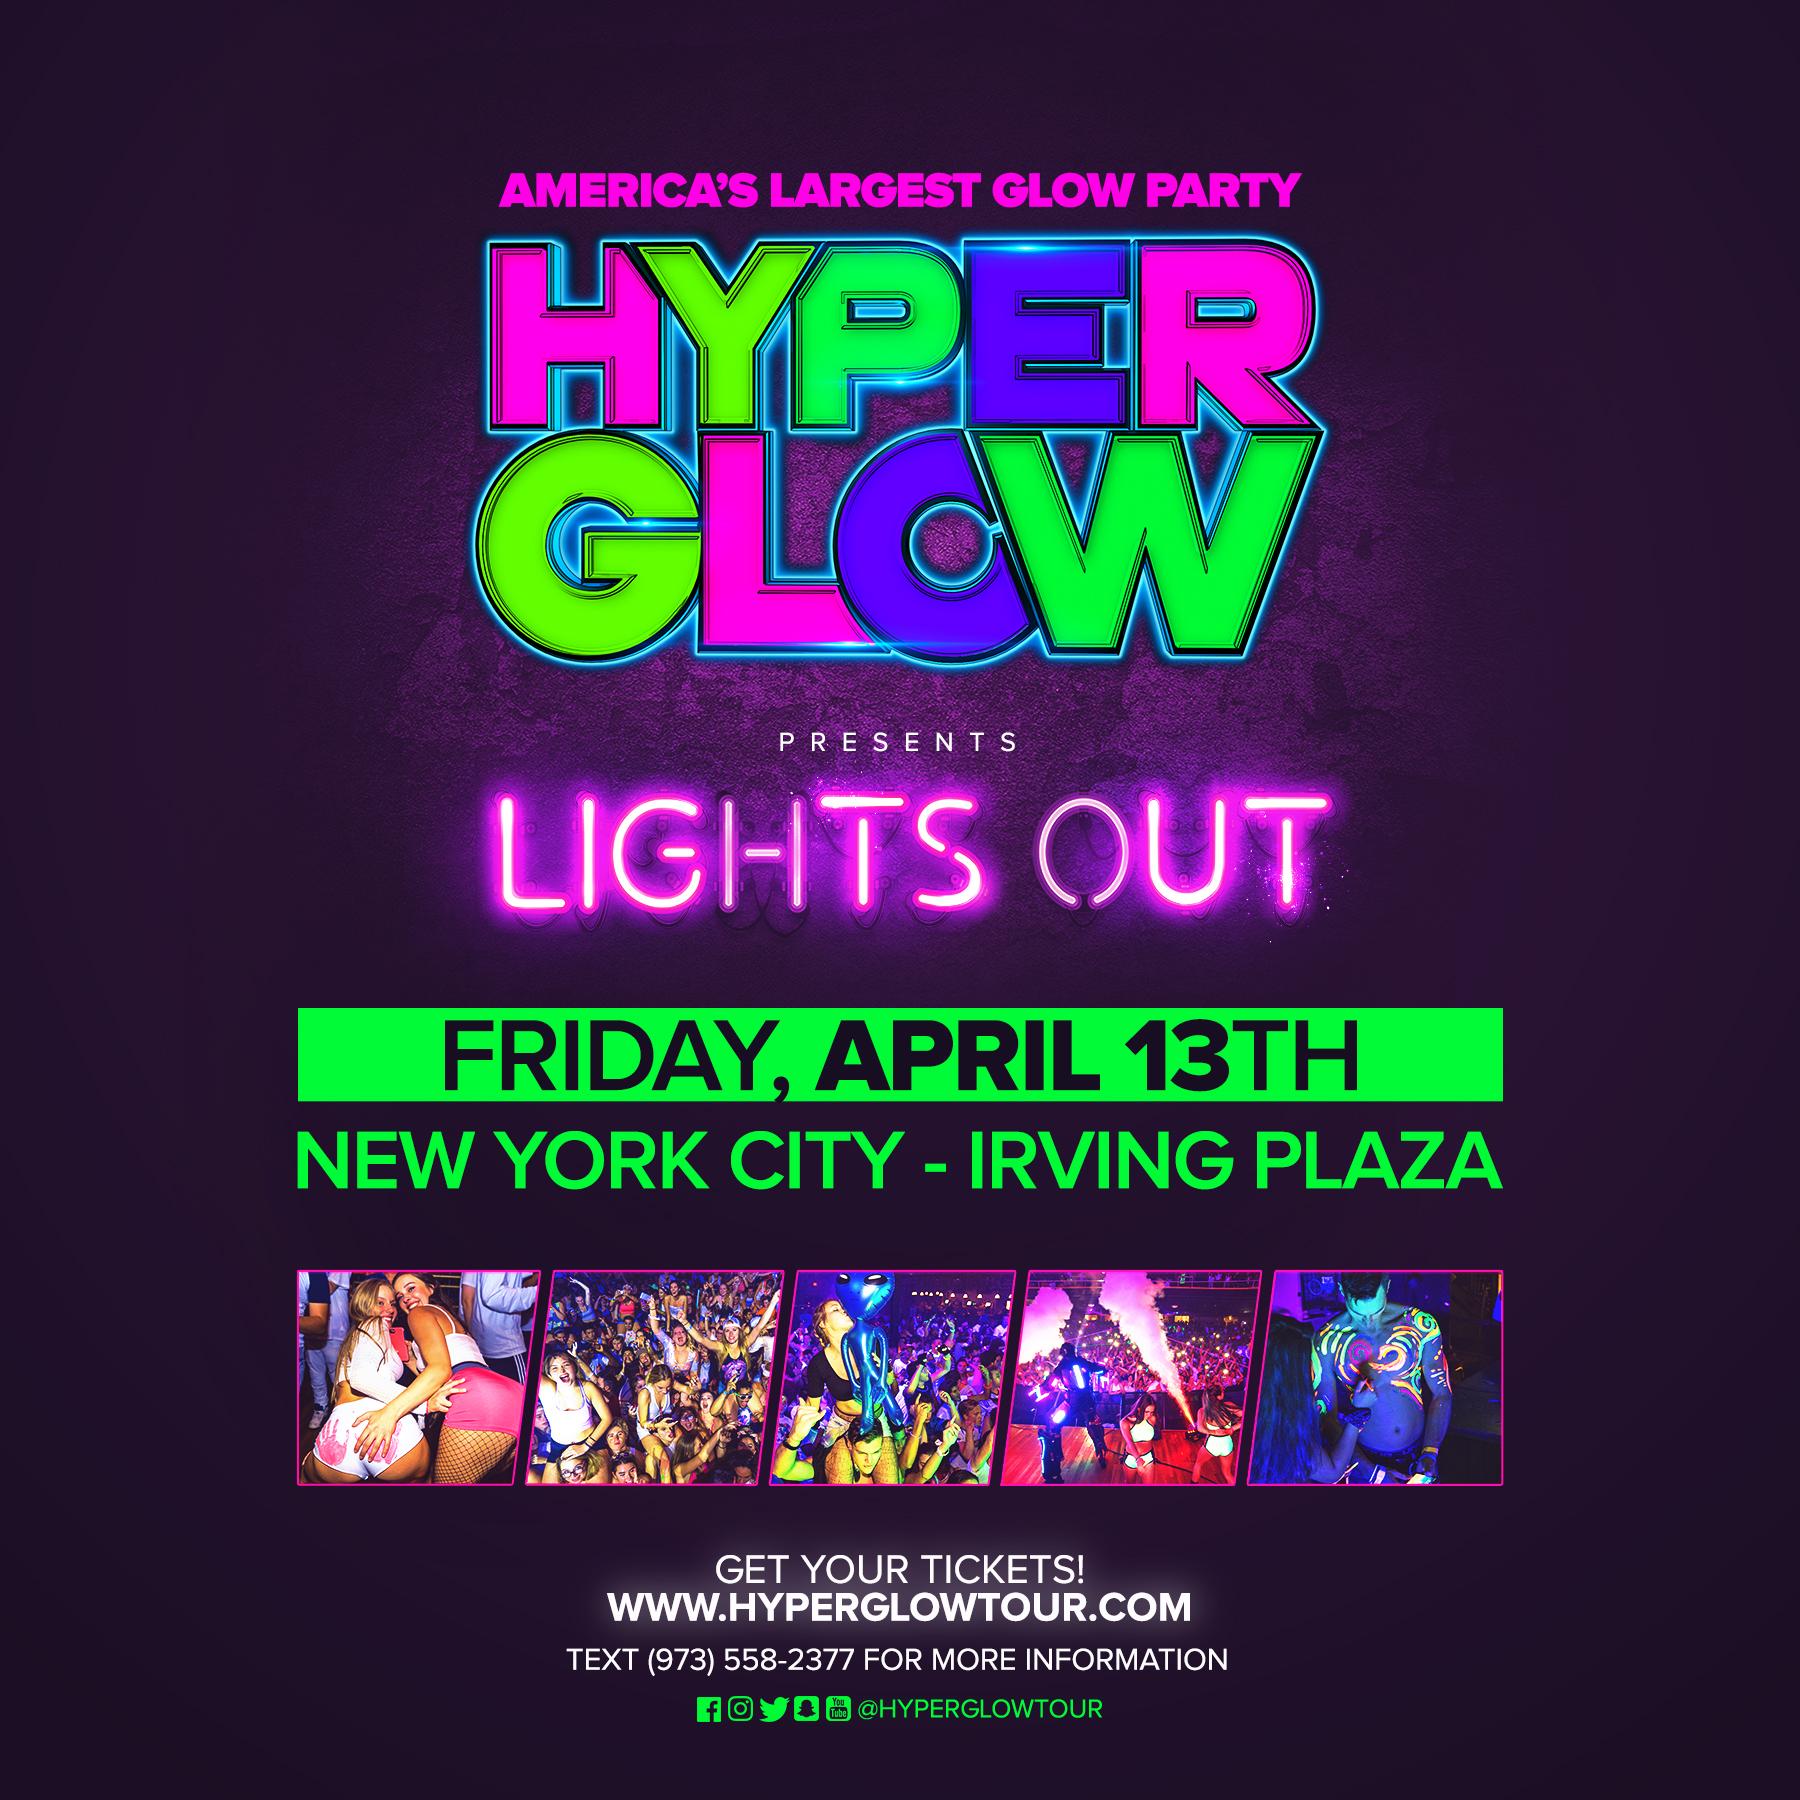 HyperGlow_LightsOut_NYC_6x6.jpg